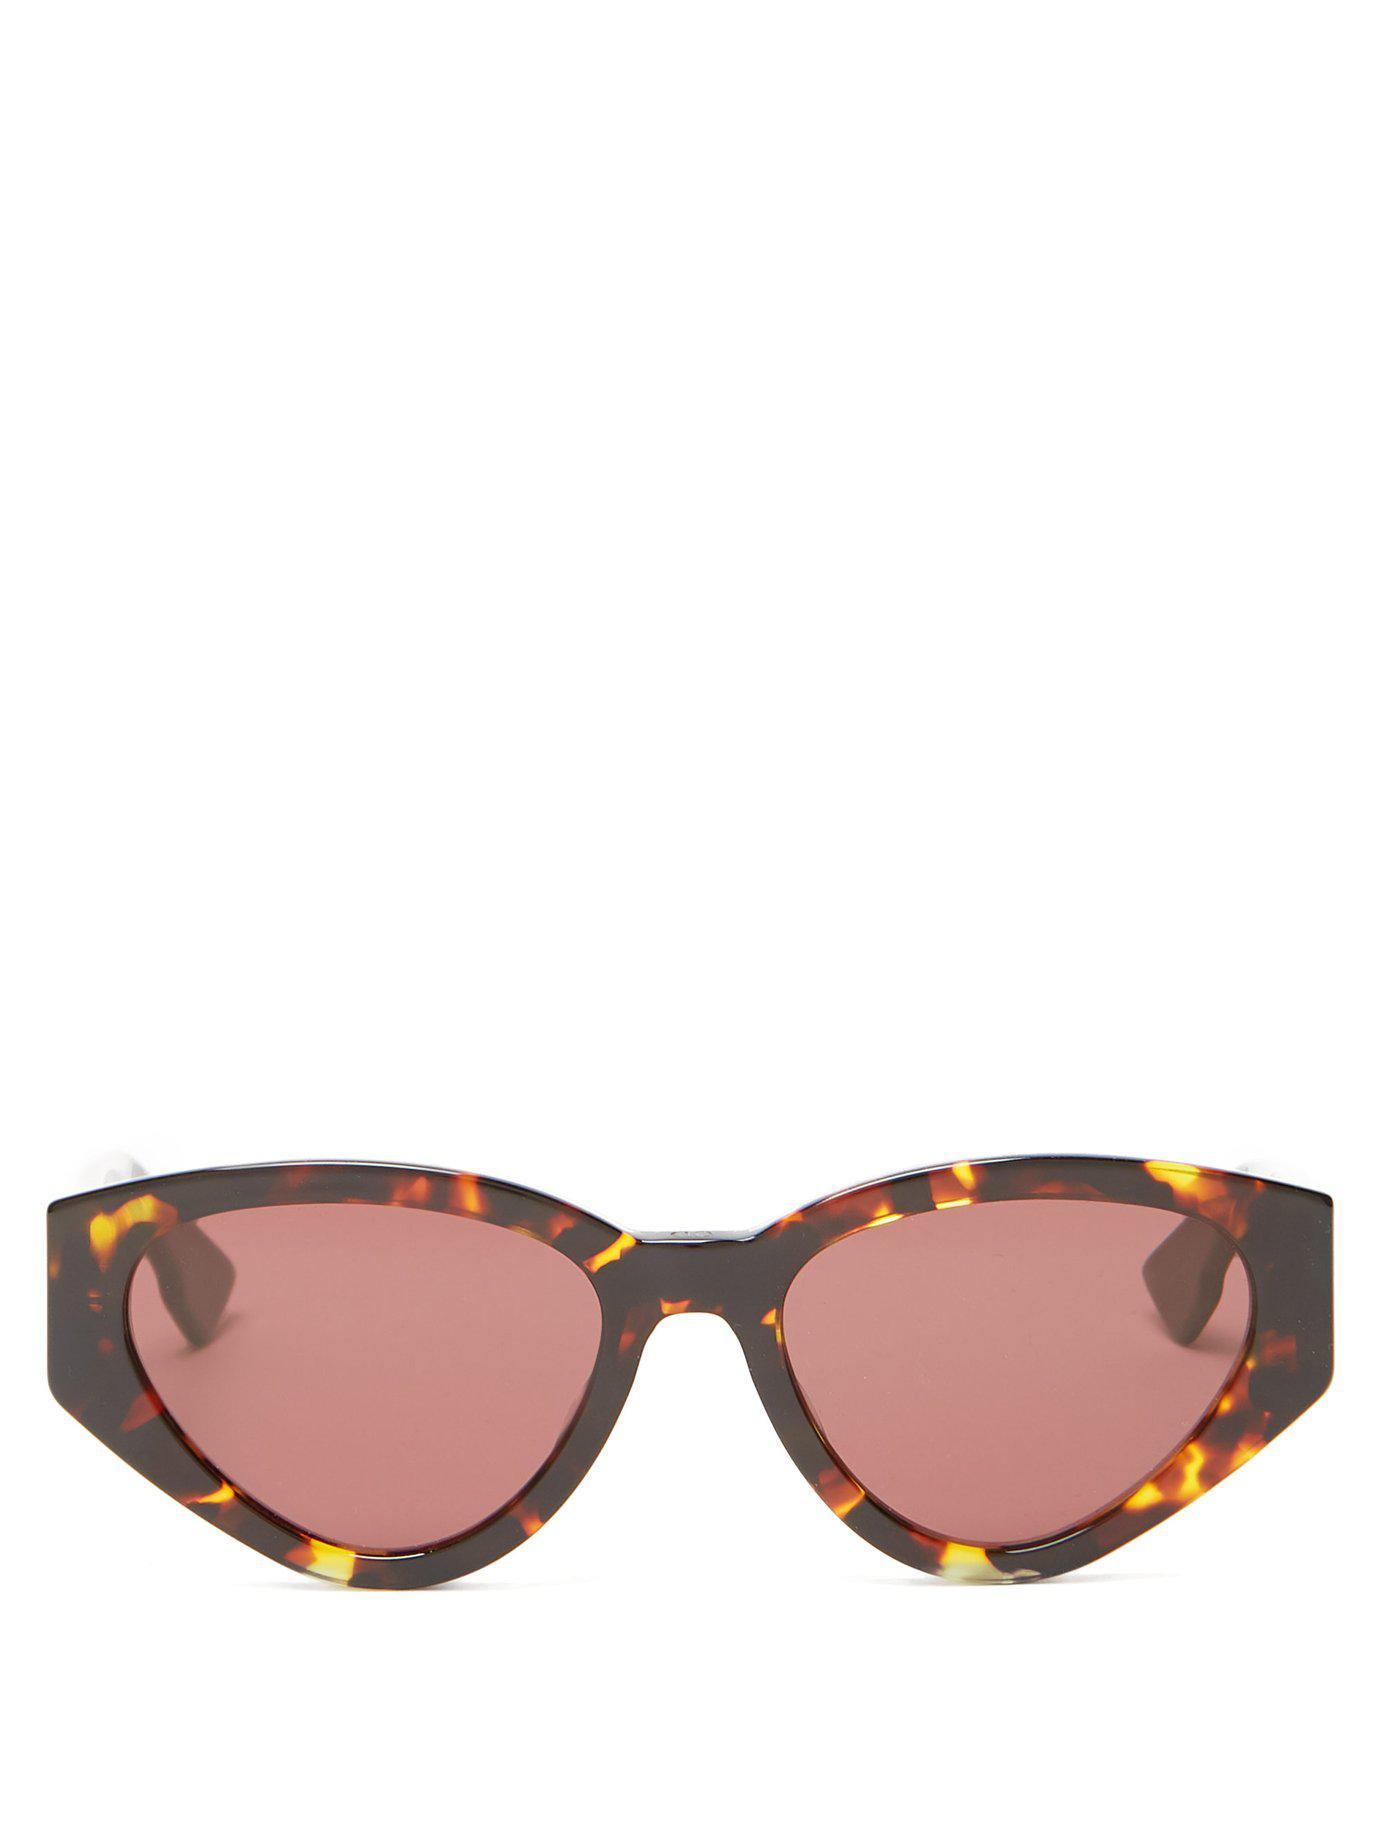 f928943eb6 Dior. Women s Diorspirit2 Cat Eye Acetate Sunglasses